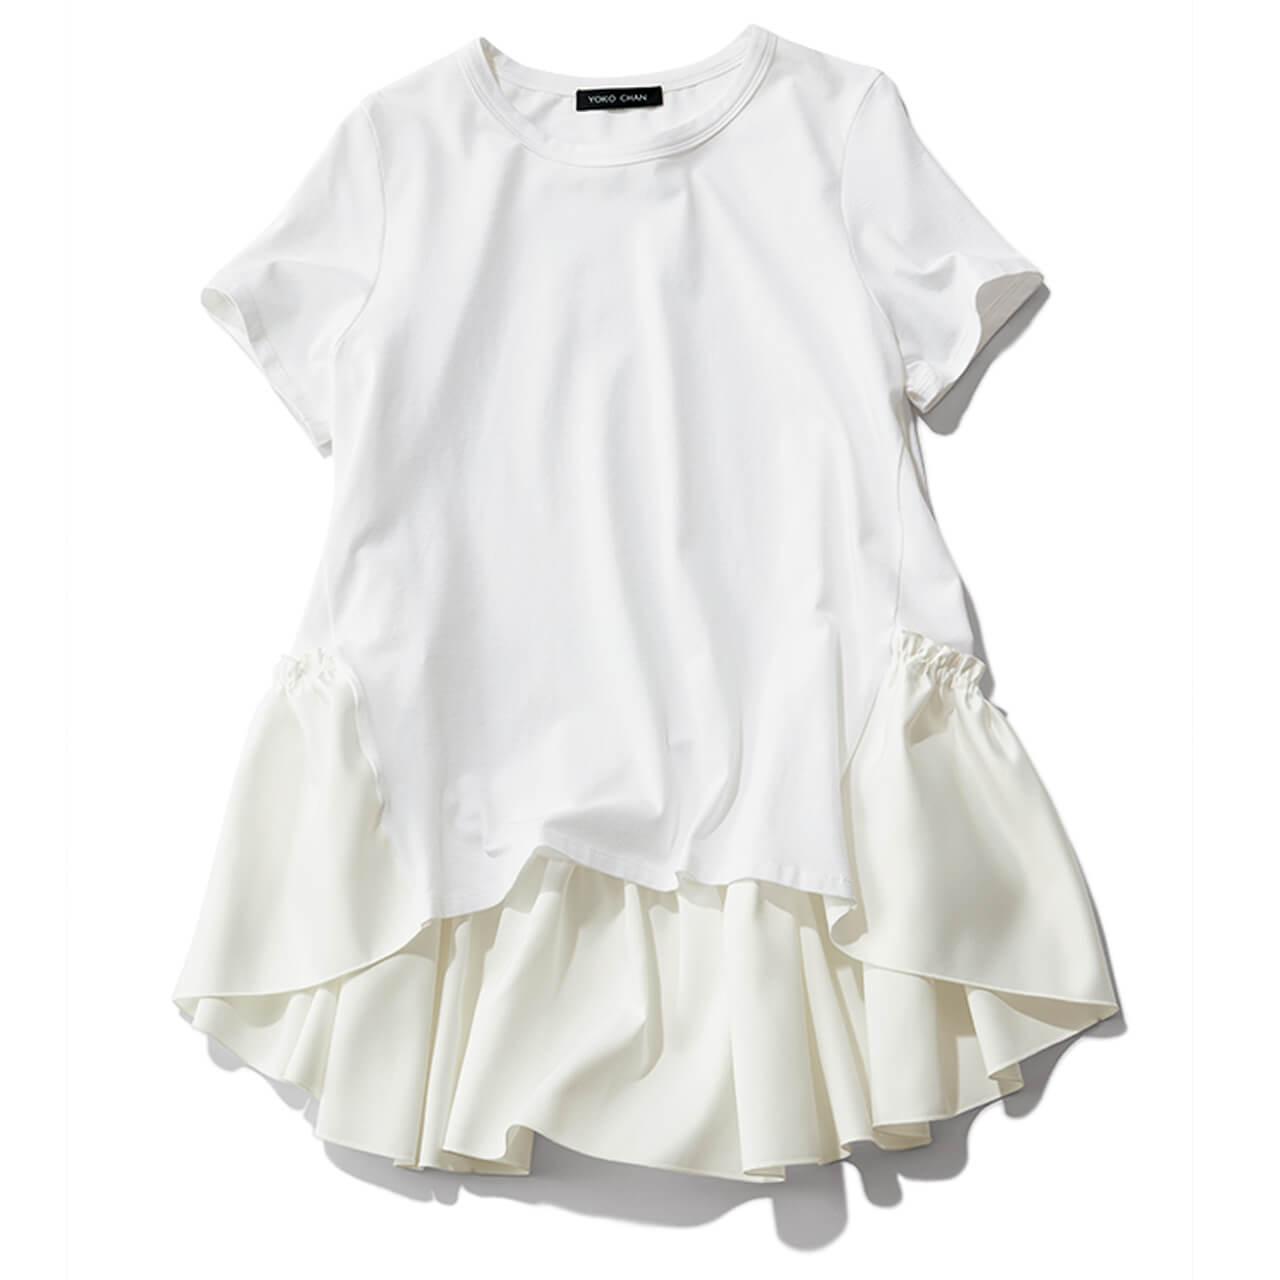 Tシャツ¥23100/YOKO CHAN